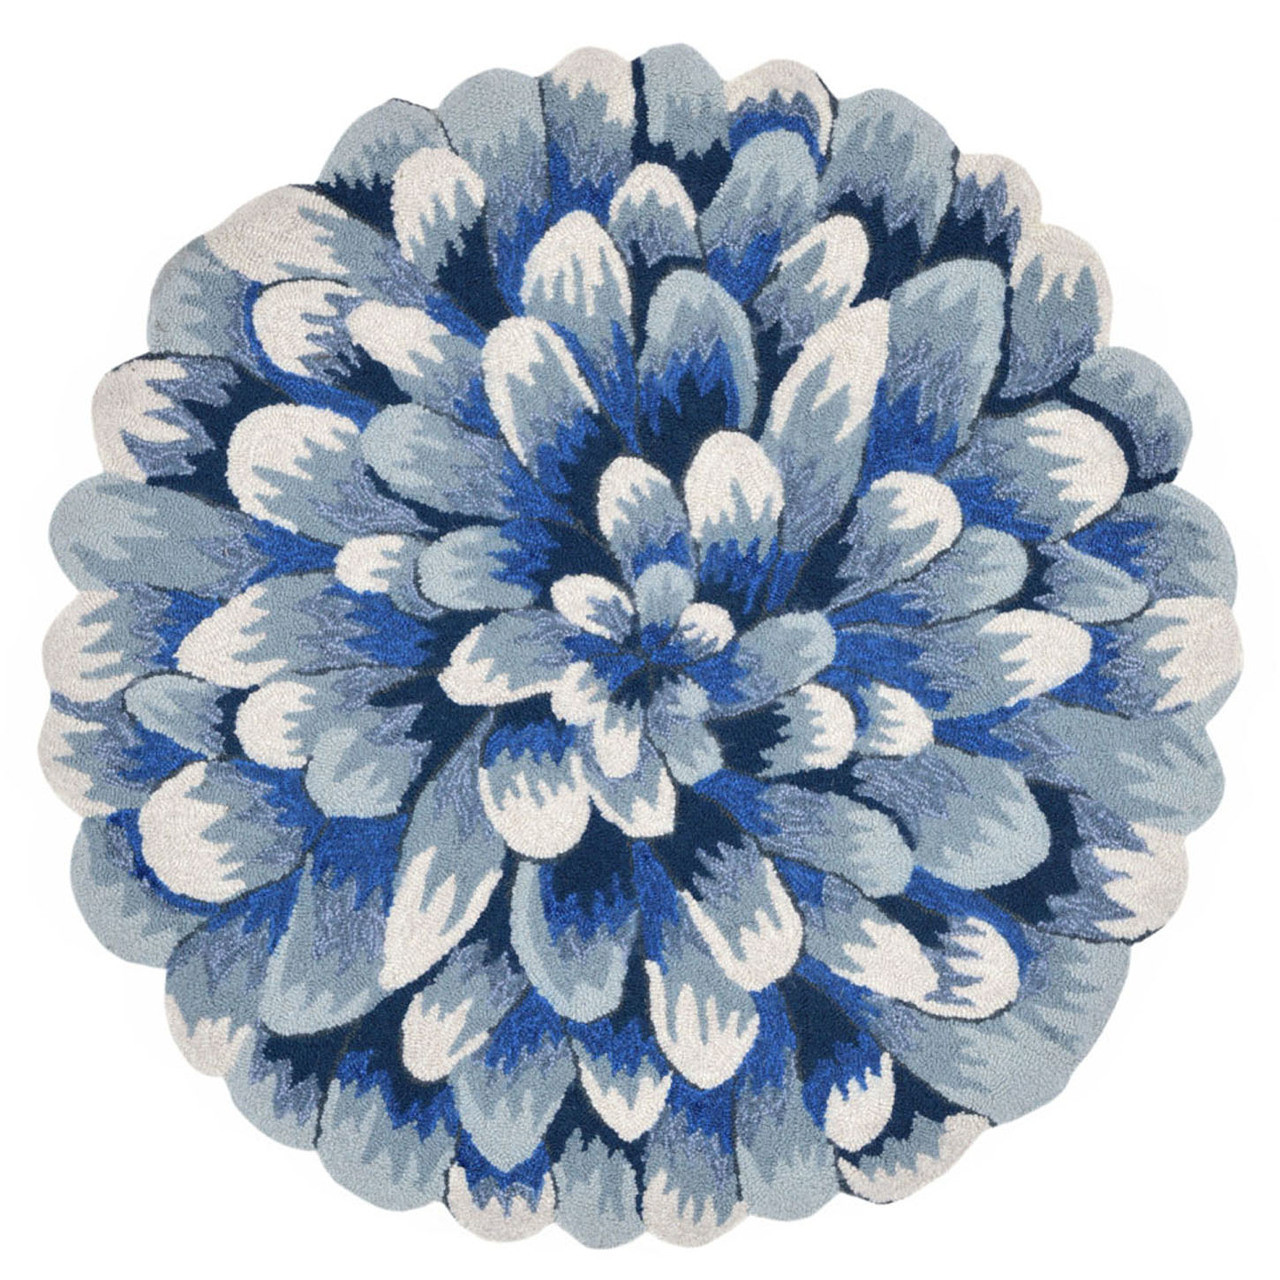 Area Rugs Blue Chrysanthemum Indoor Outdoor Rug 5 Round Rug Floral Decor